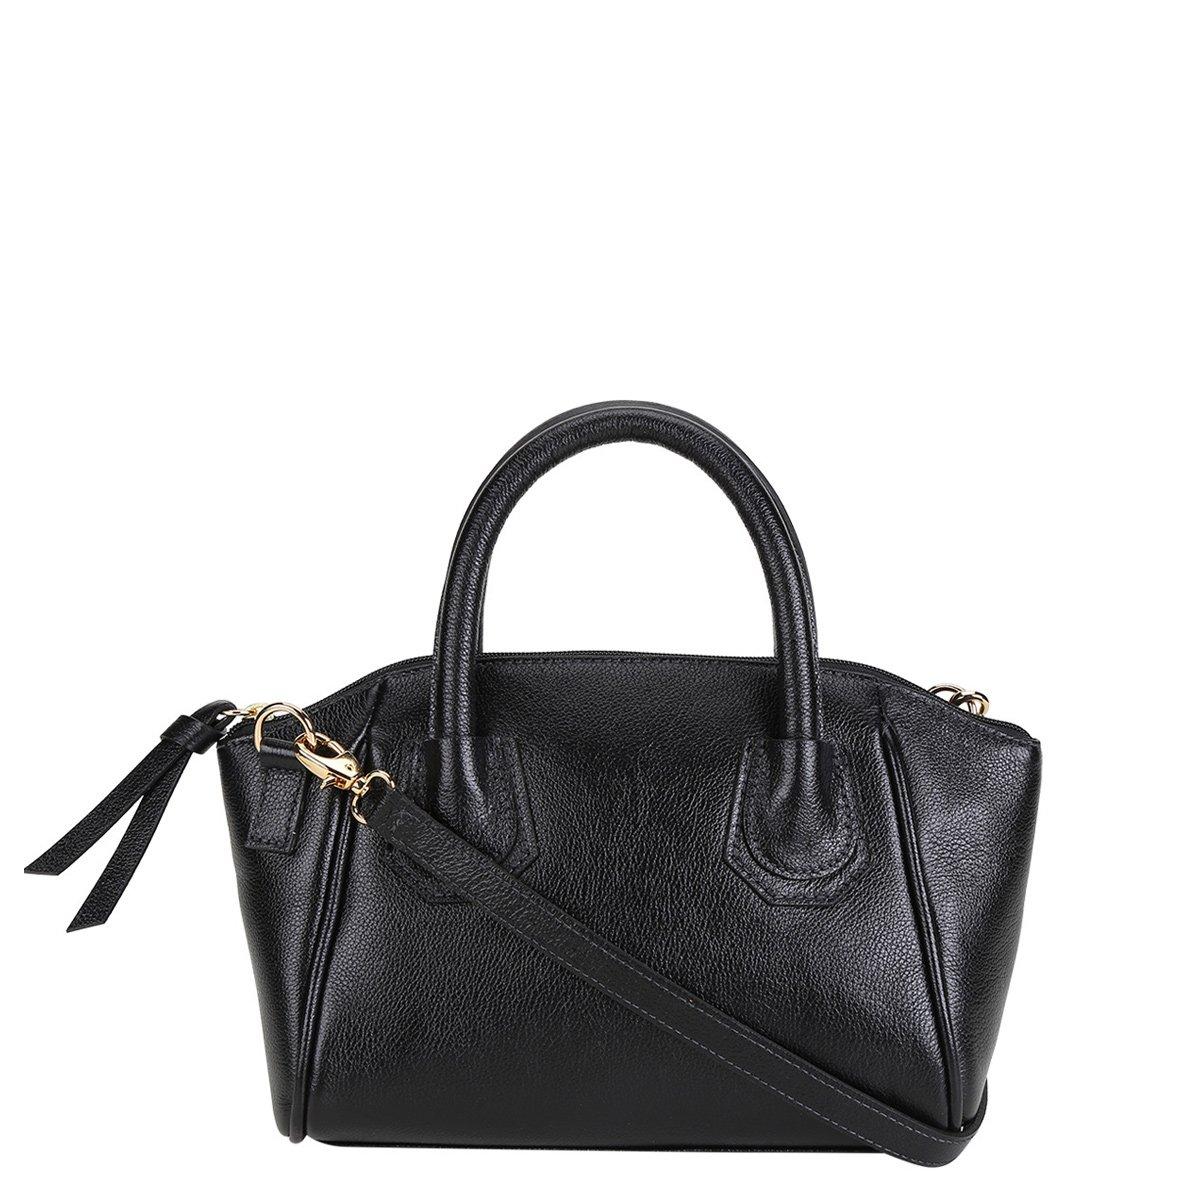 8eba97d26 Bolsa Couro Shoestock Mini Bag Clássica Tiracolo Feminina | Shoestock